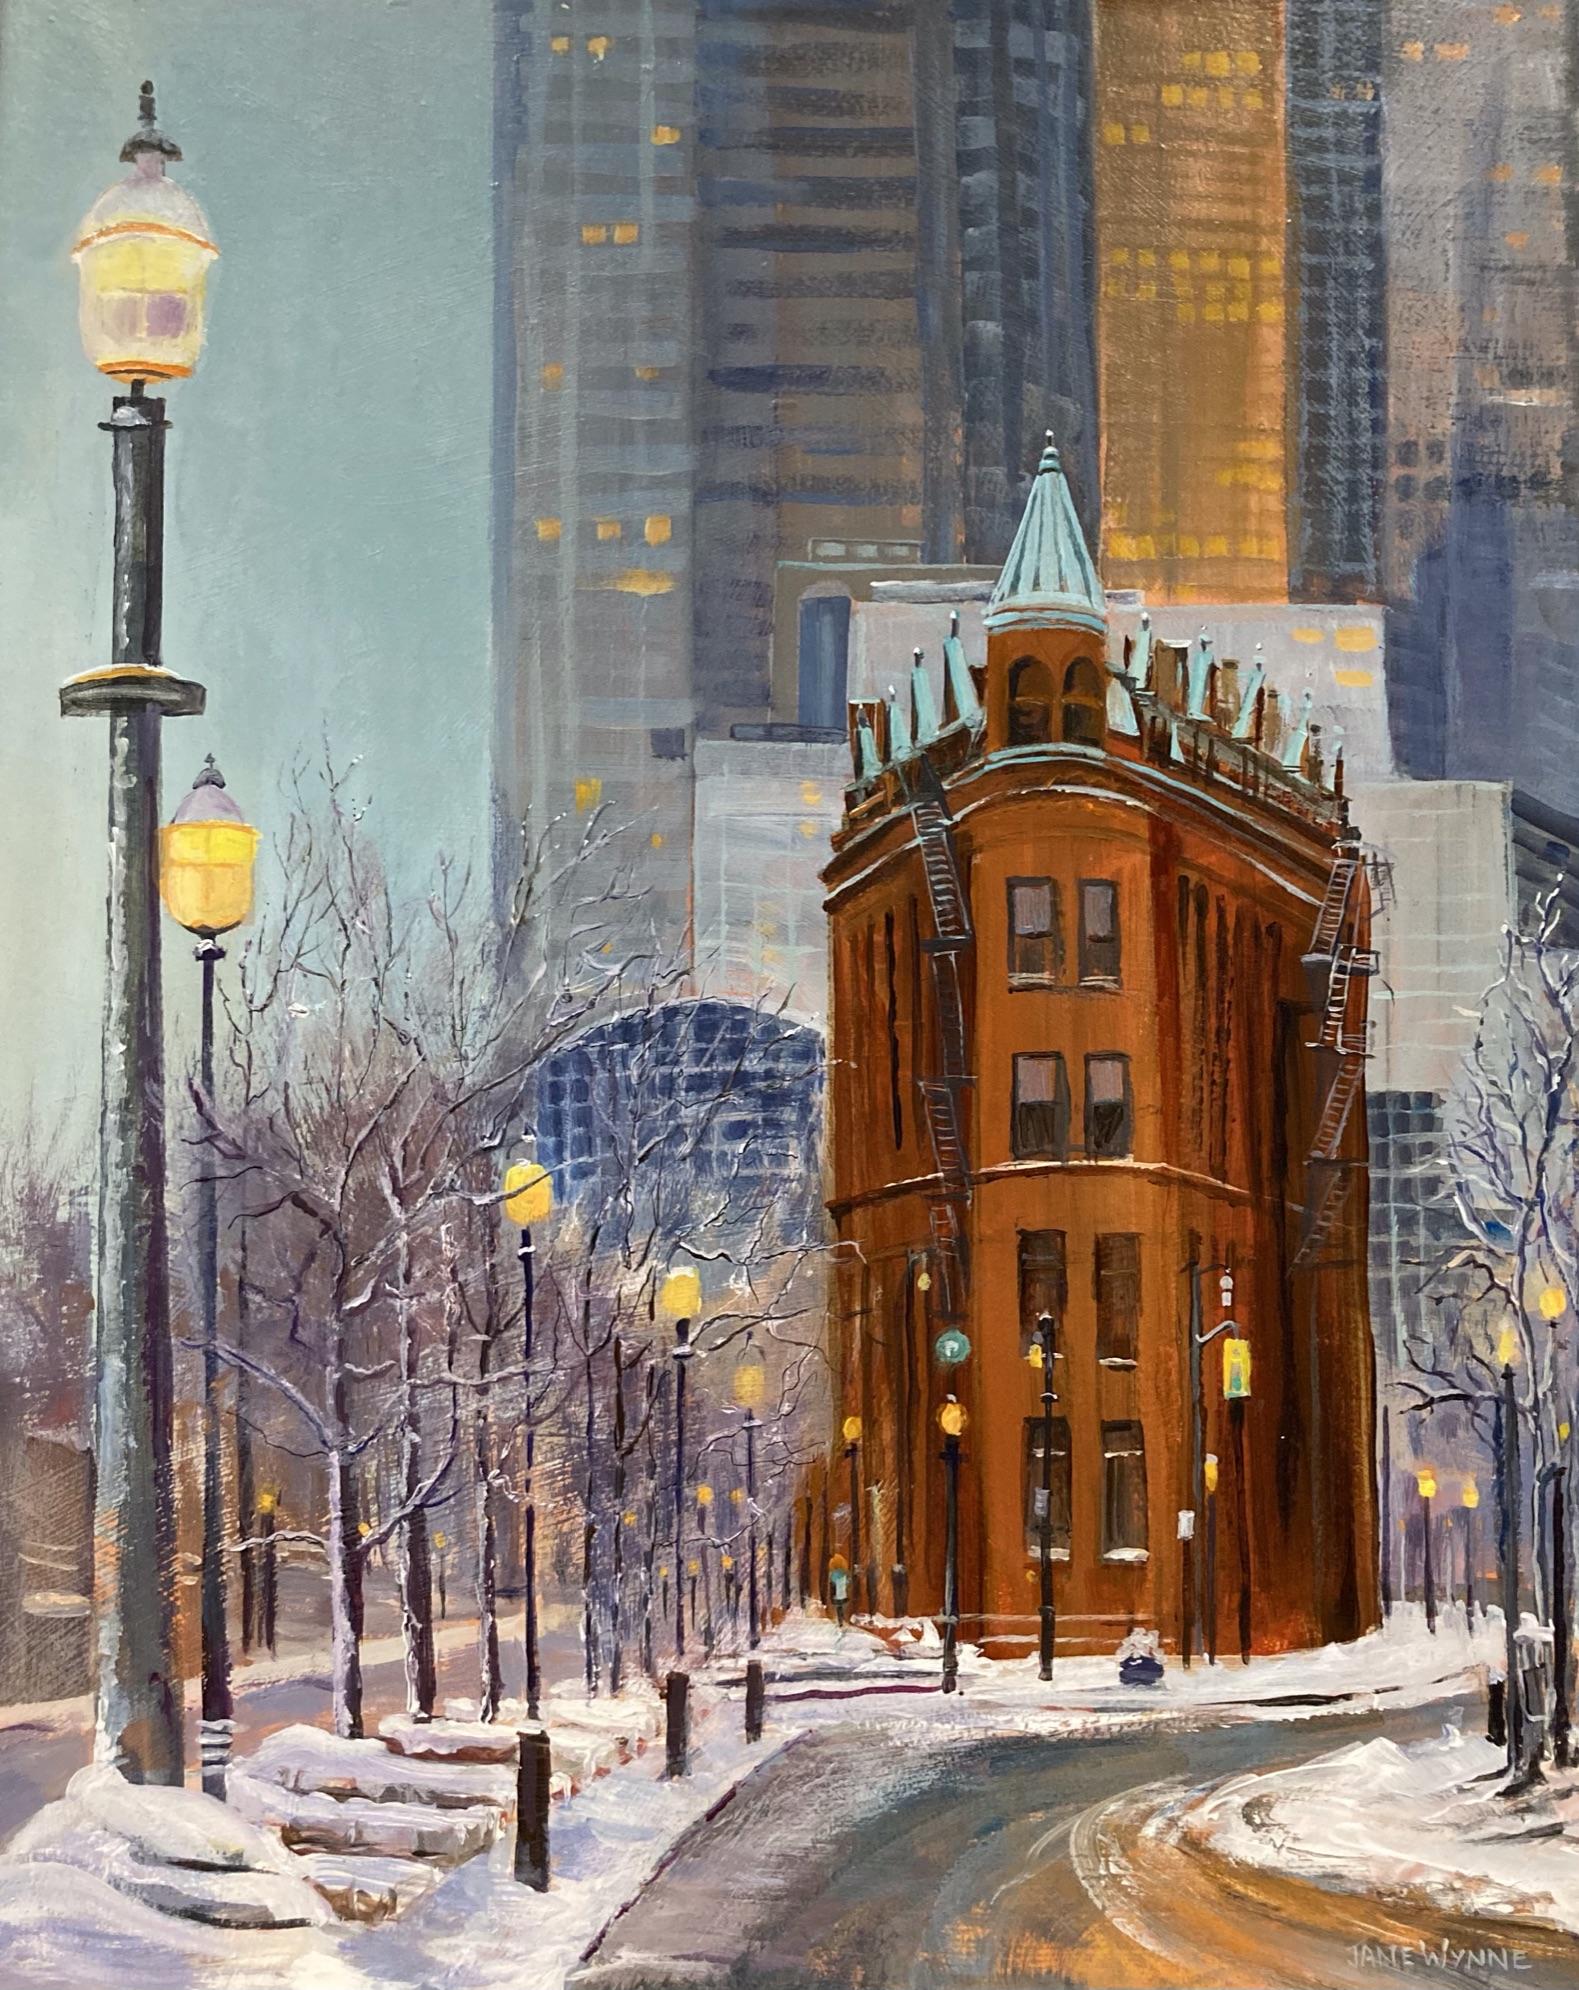 Flat Iron Building by Jane Wynne